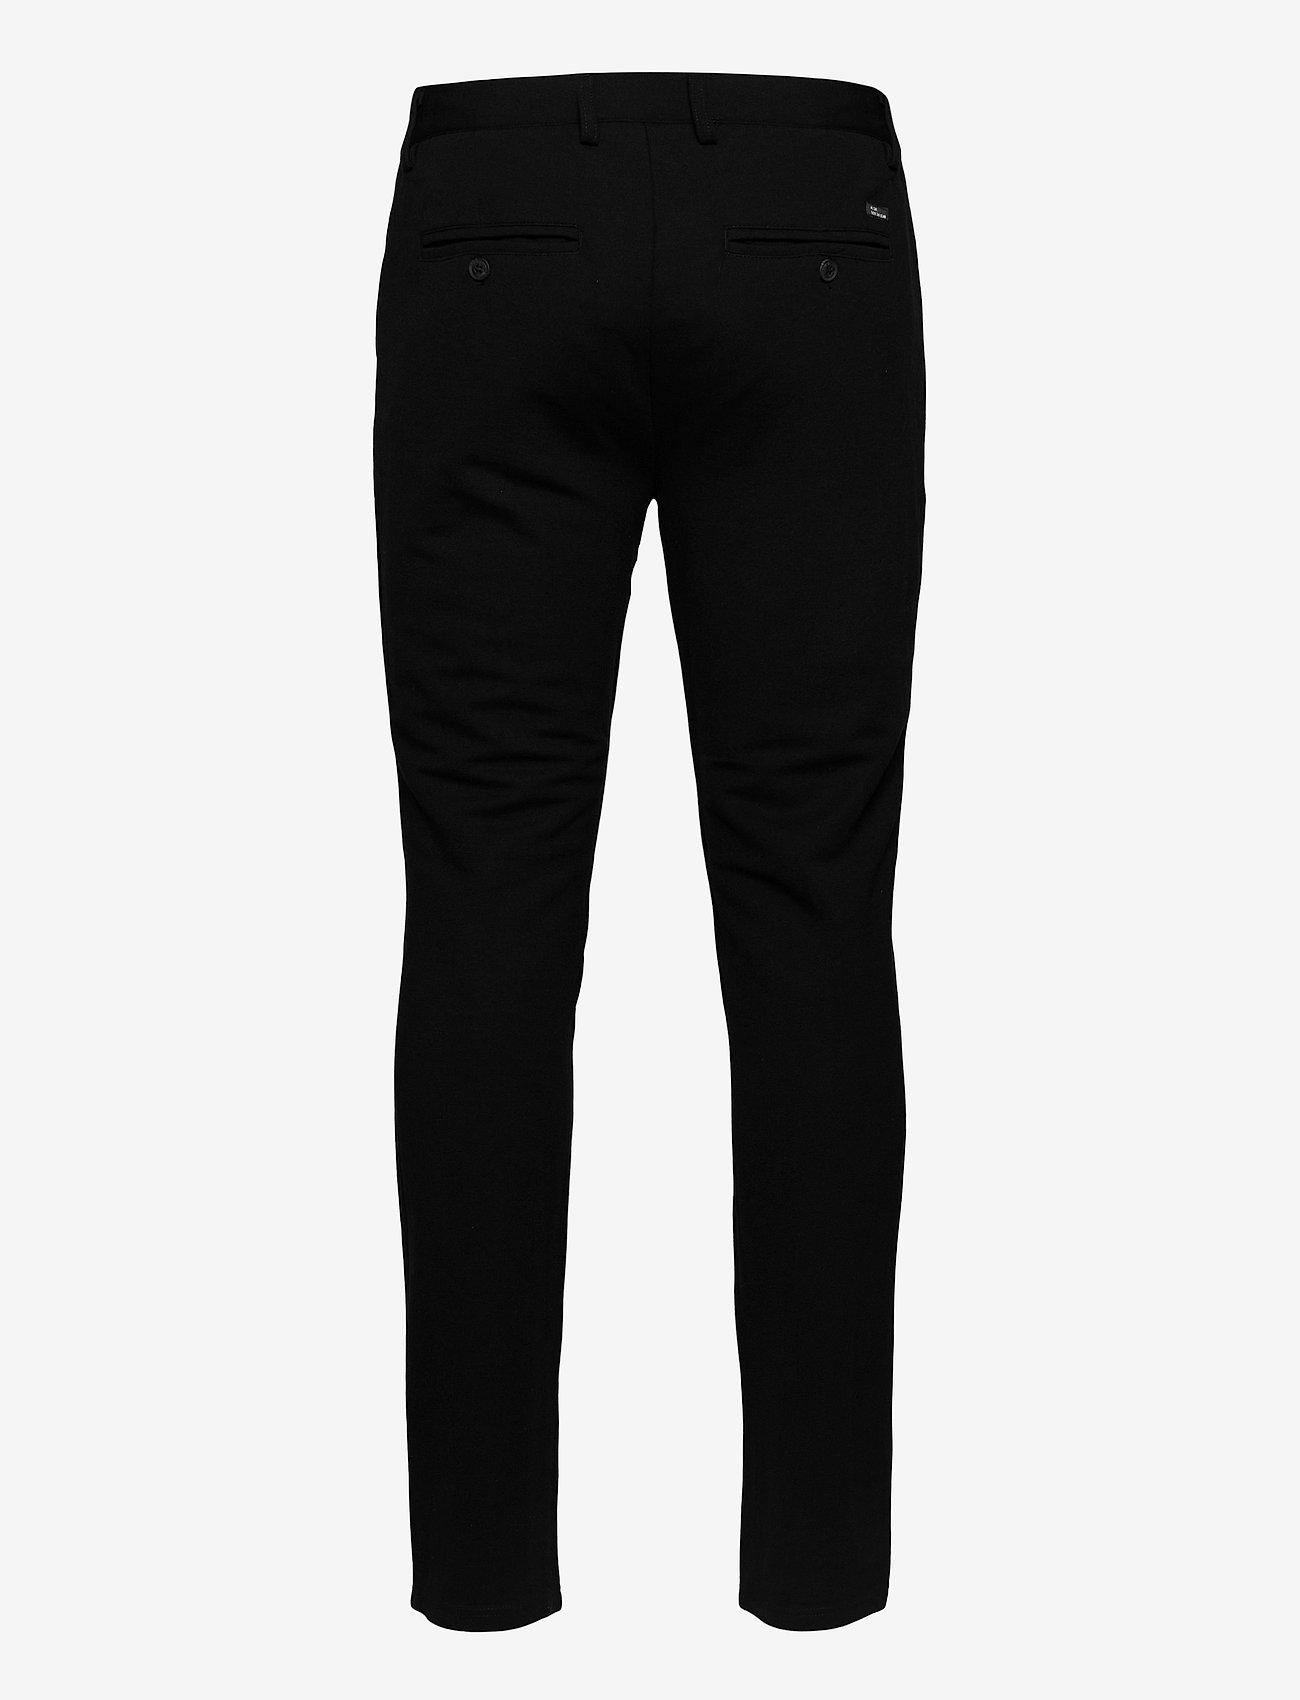 Blend - Pants - od garnituru - black - 1